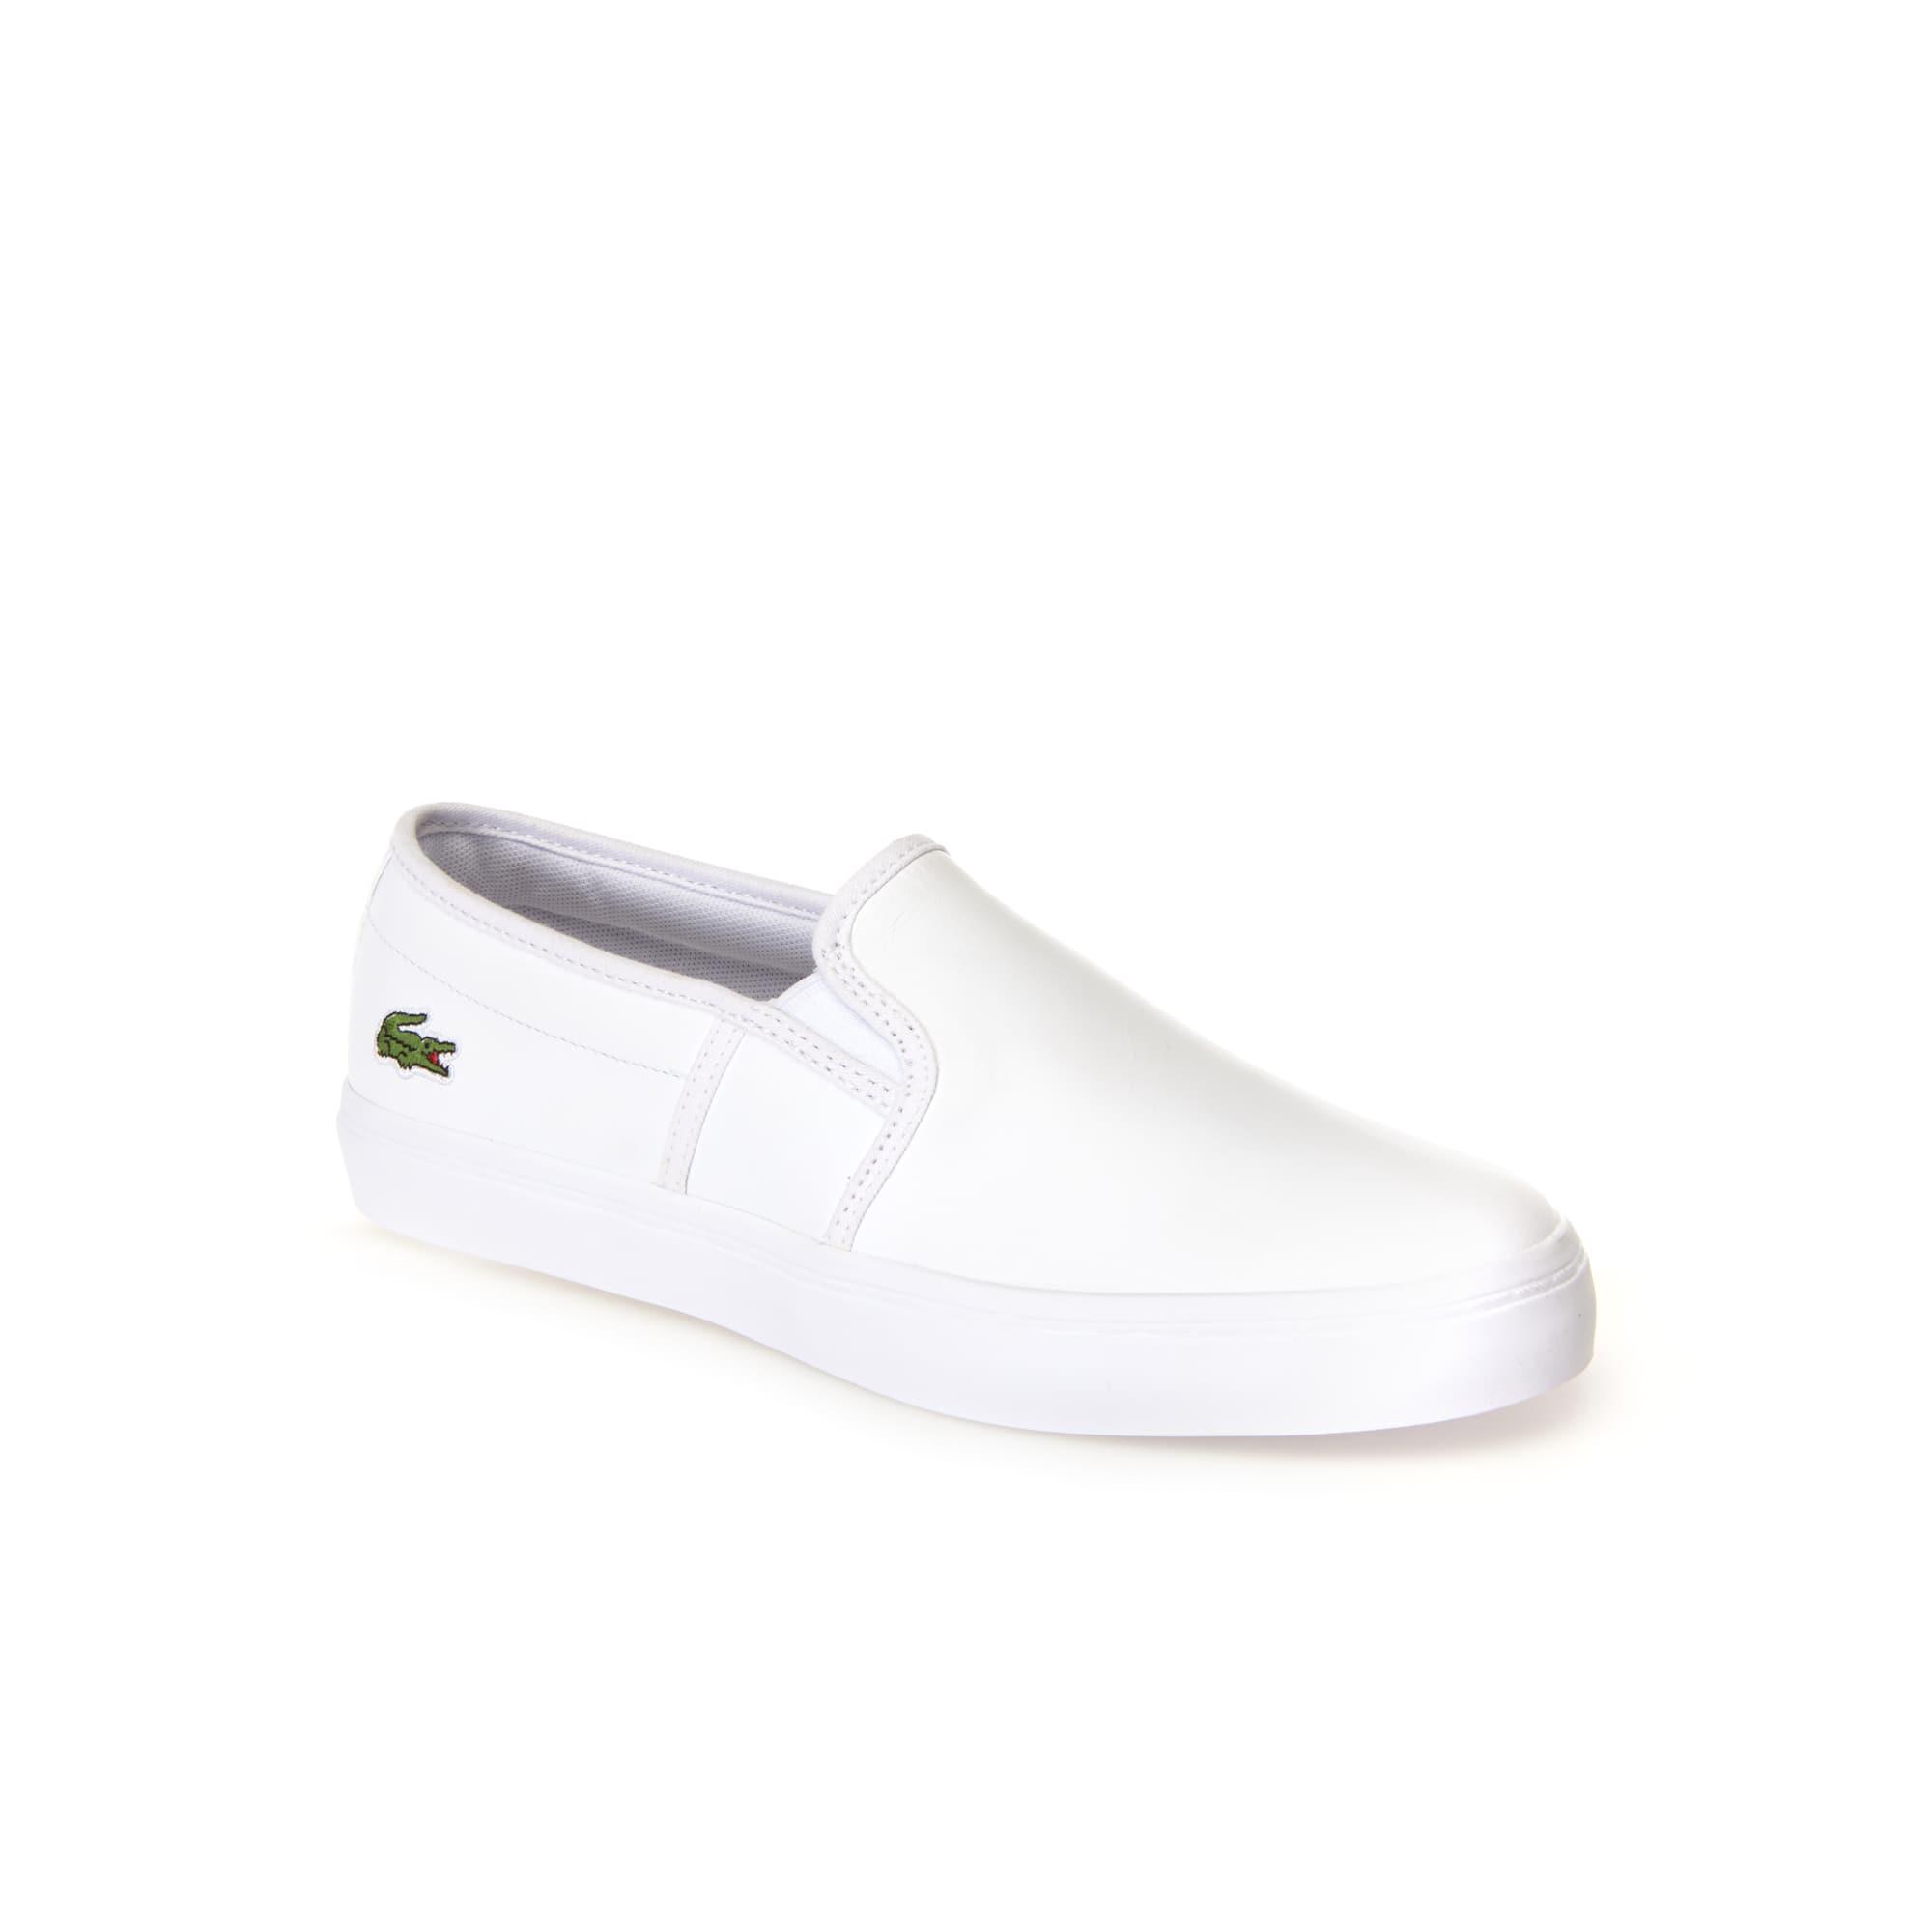 606c857069b5 Women s Gazon Leather Slip-ons